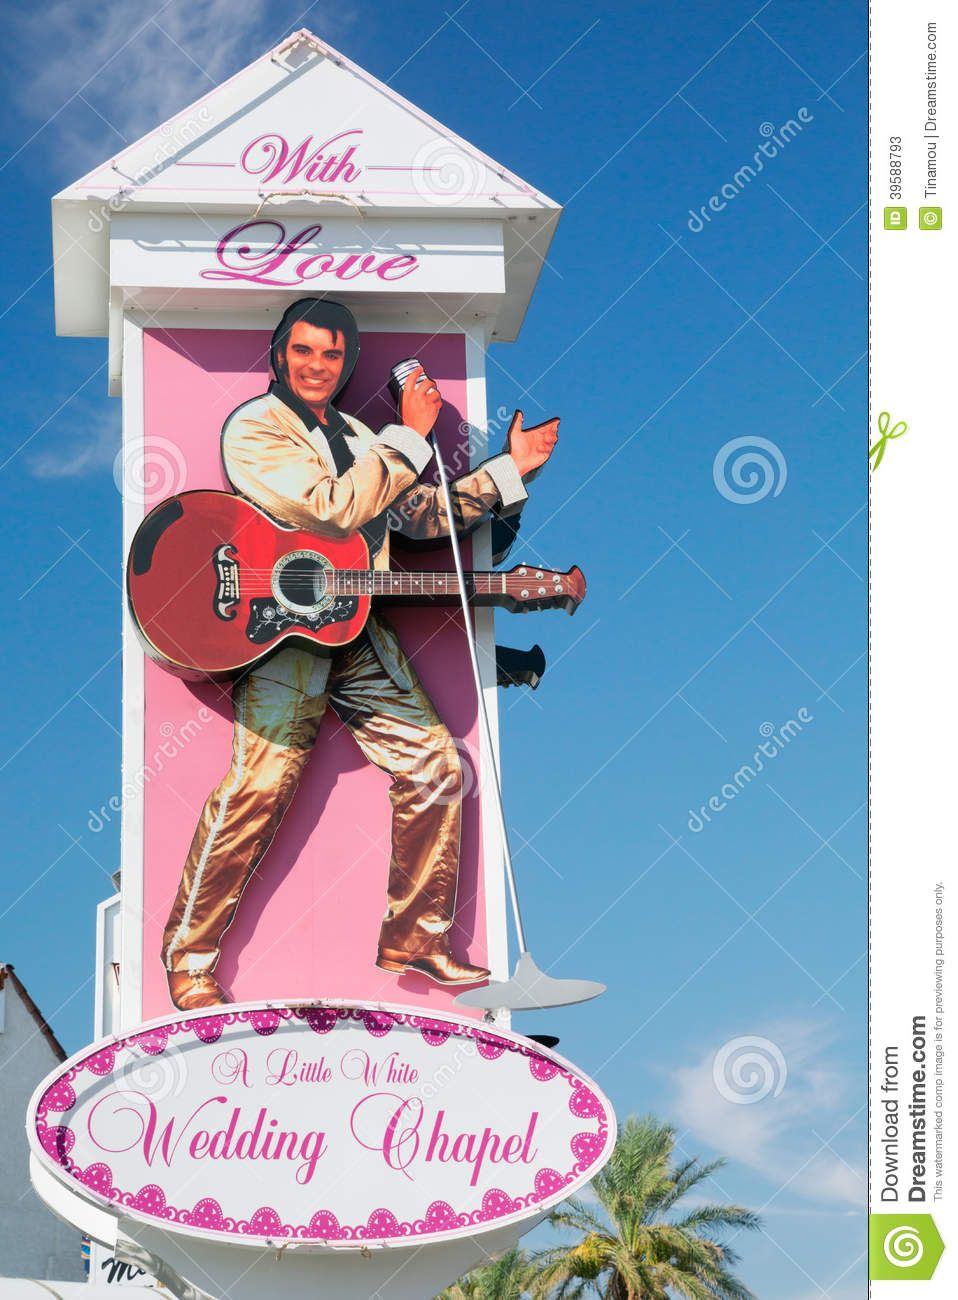 vegas wedding chapels VEGAS Wedding The Ceremony at Elvis Presley Chapel Las Vegas dreamstime com